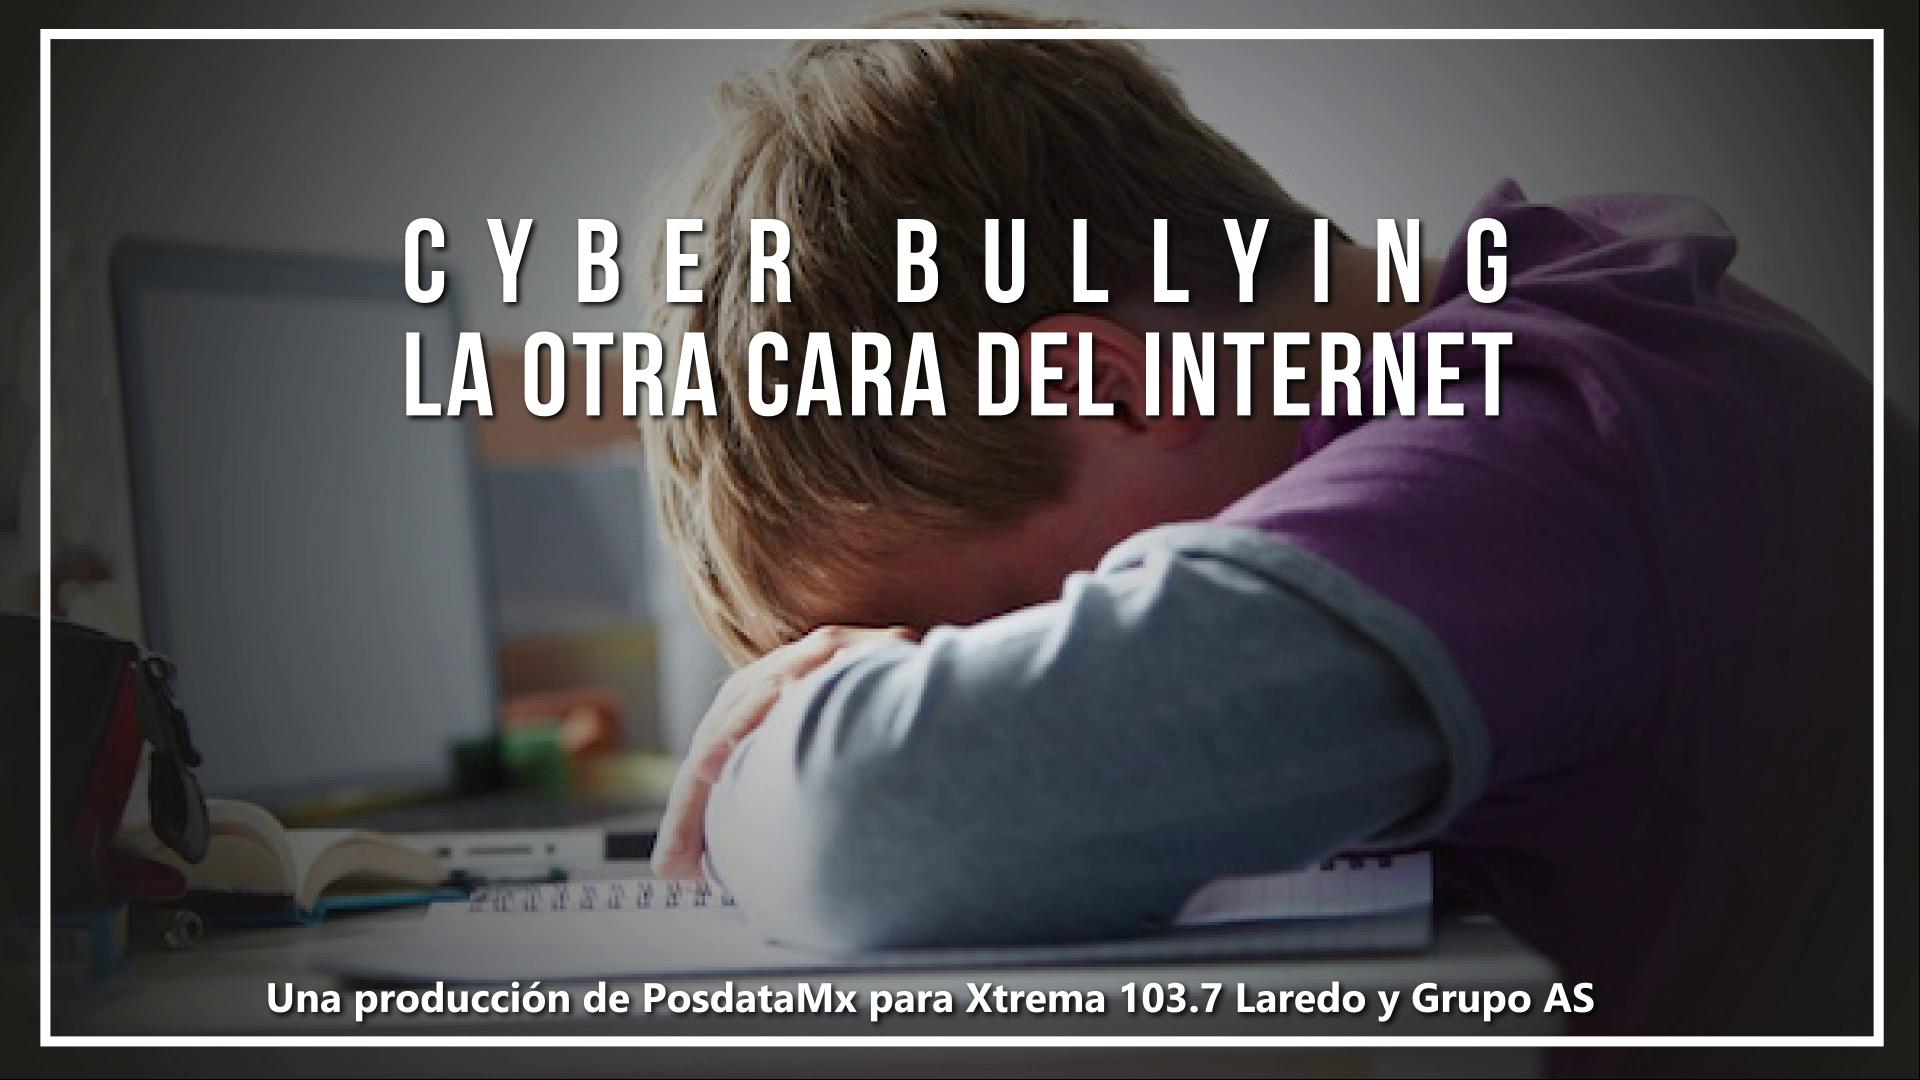 Cyber Bullying La otra cara del Internet - PosdataMx